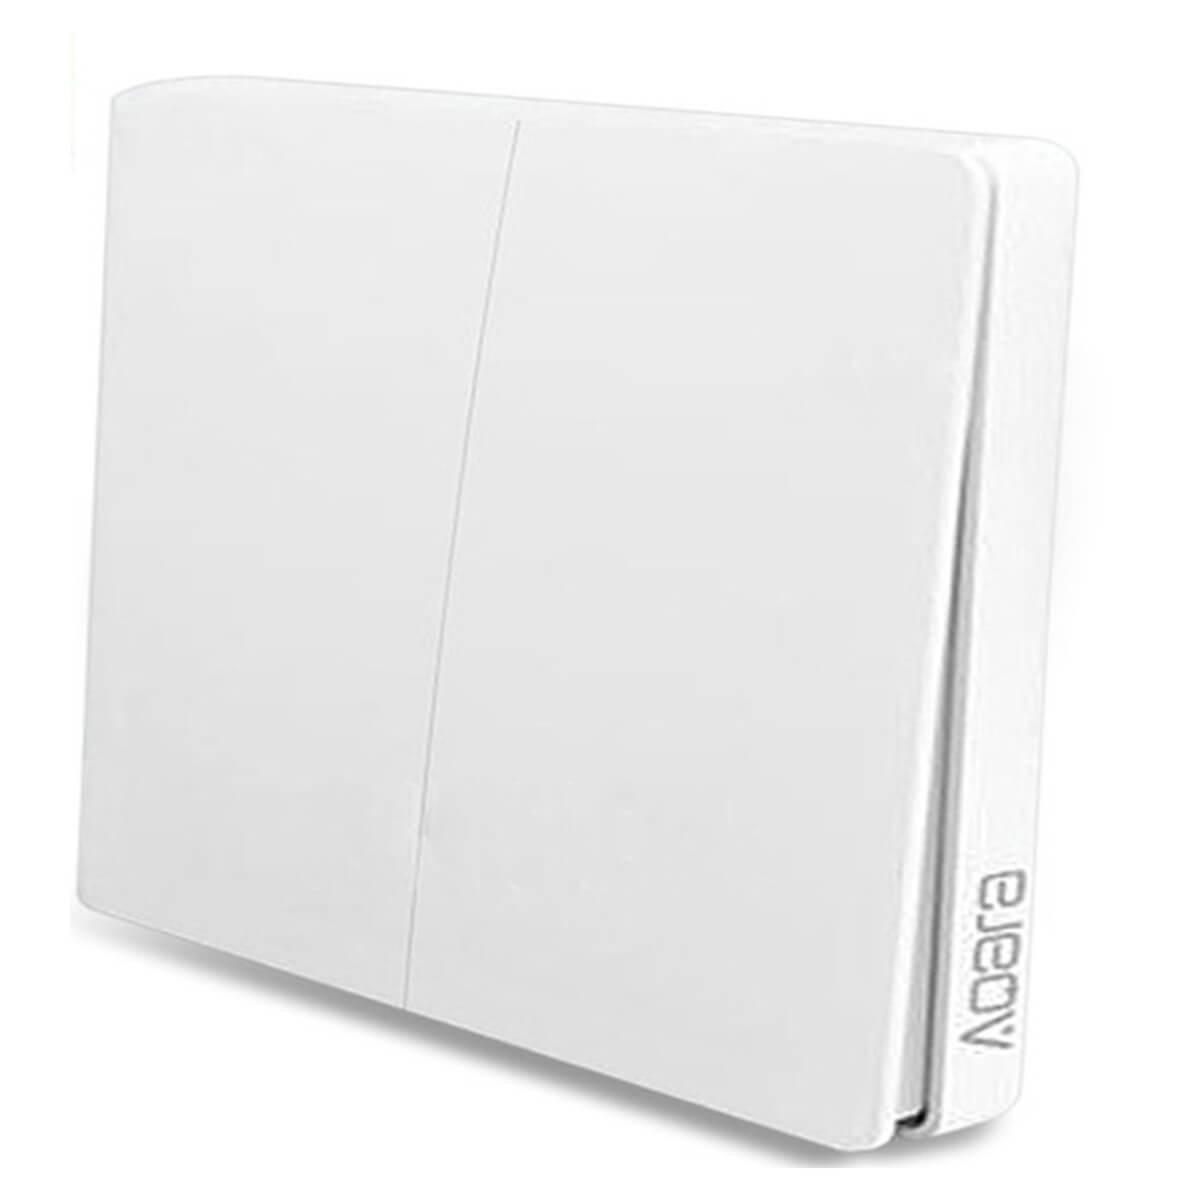 Умный выключатель Aqara Smart Light Switch ZigBee Version (2 кнопки)